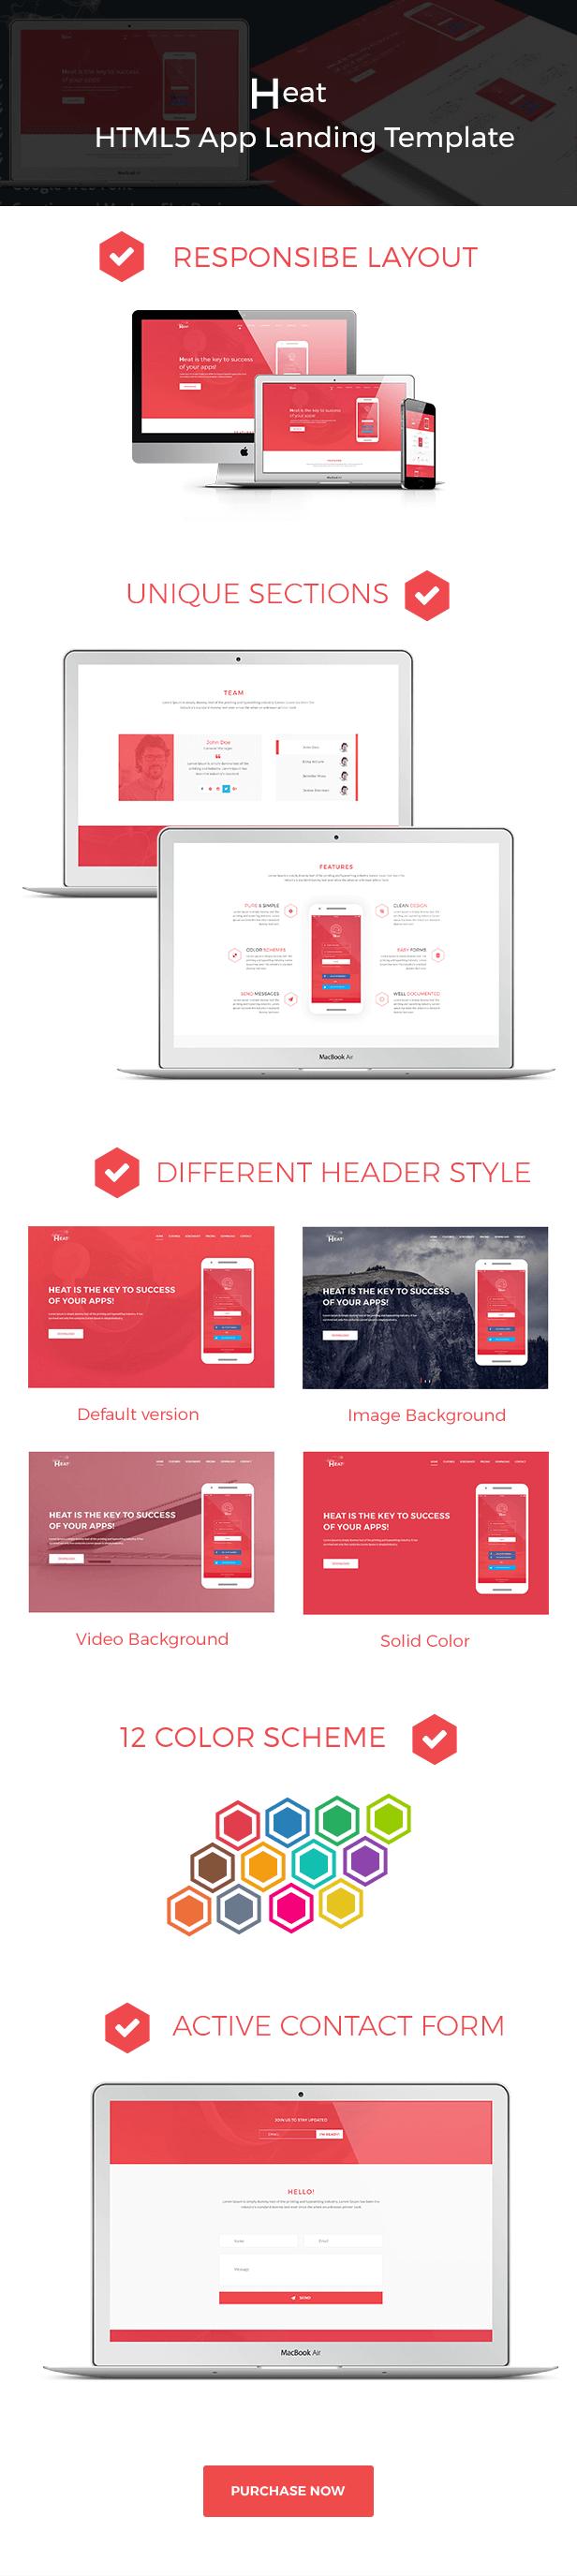 Heat - Responsive HTML5 App Landing Template